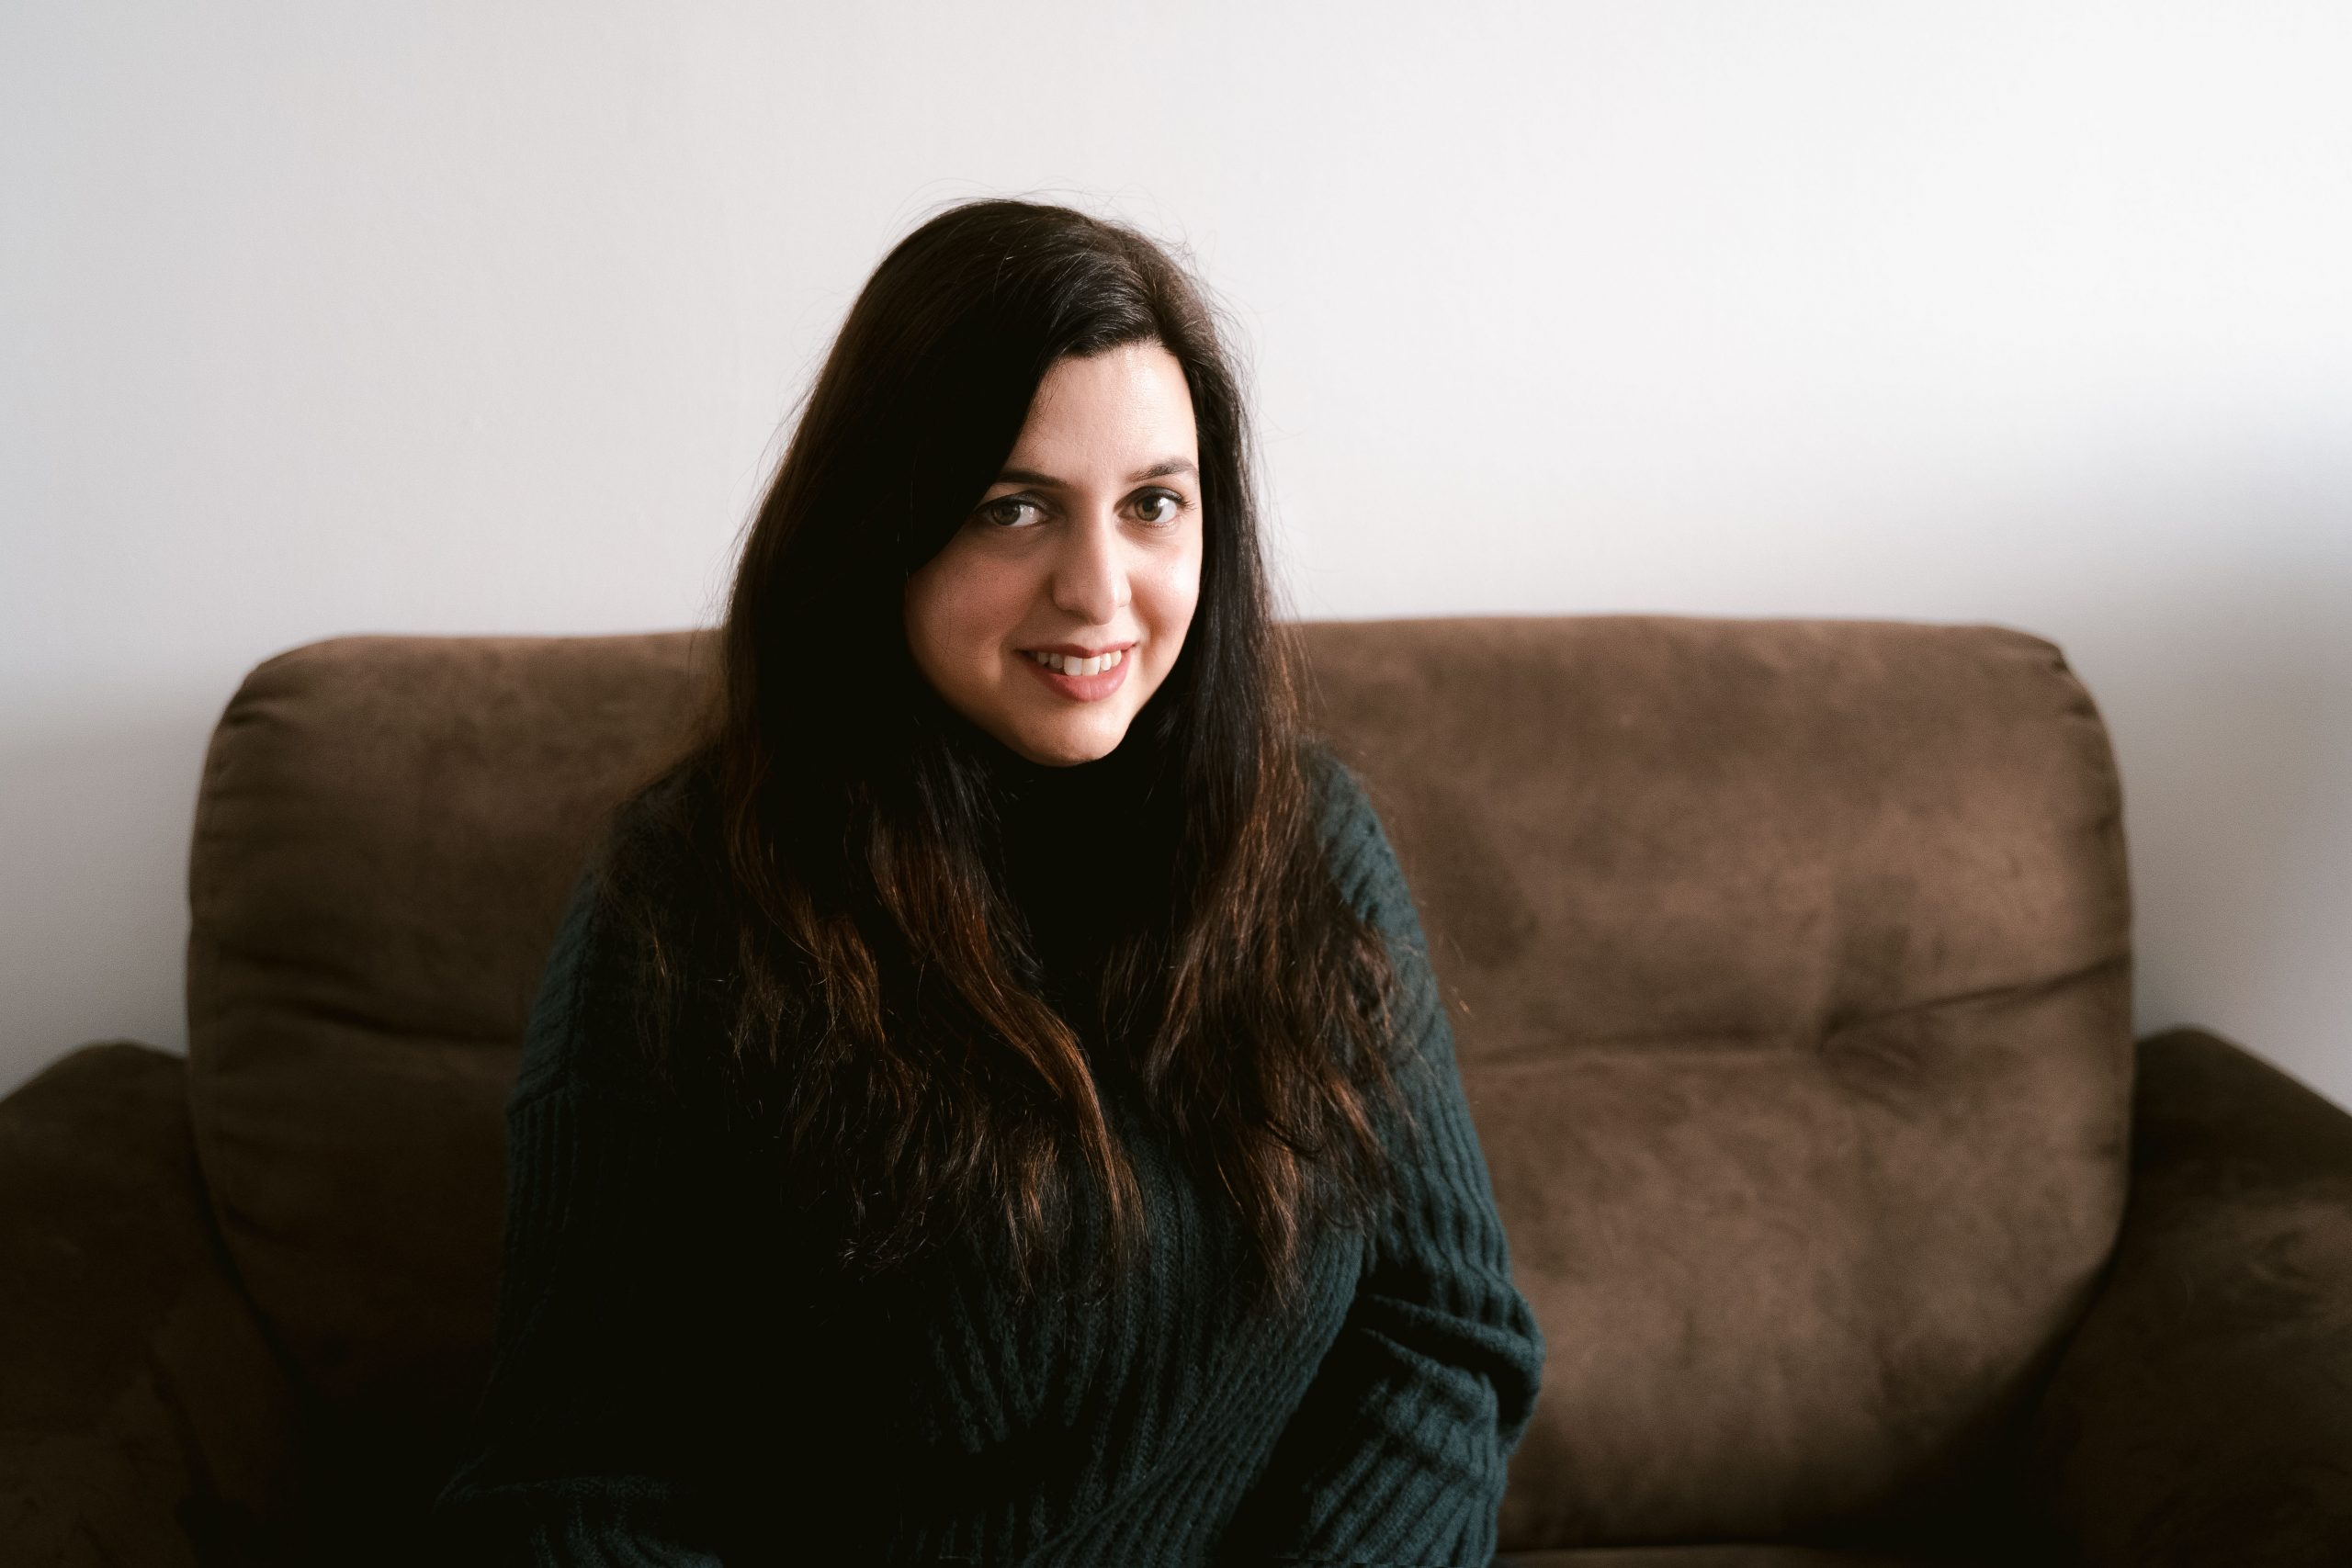 fotografa Milano; Leonora Aricò